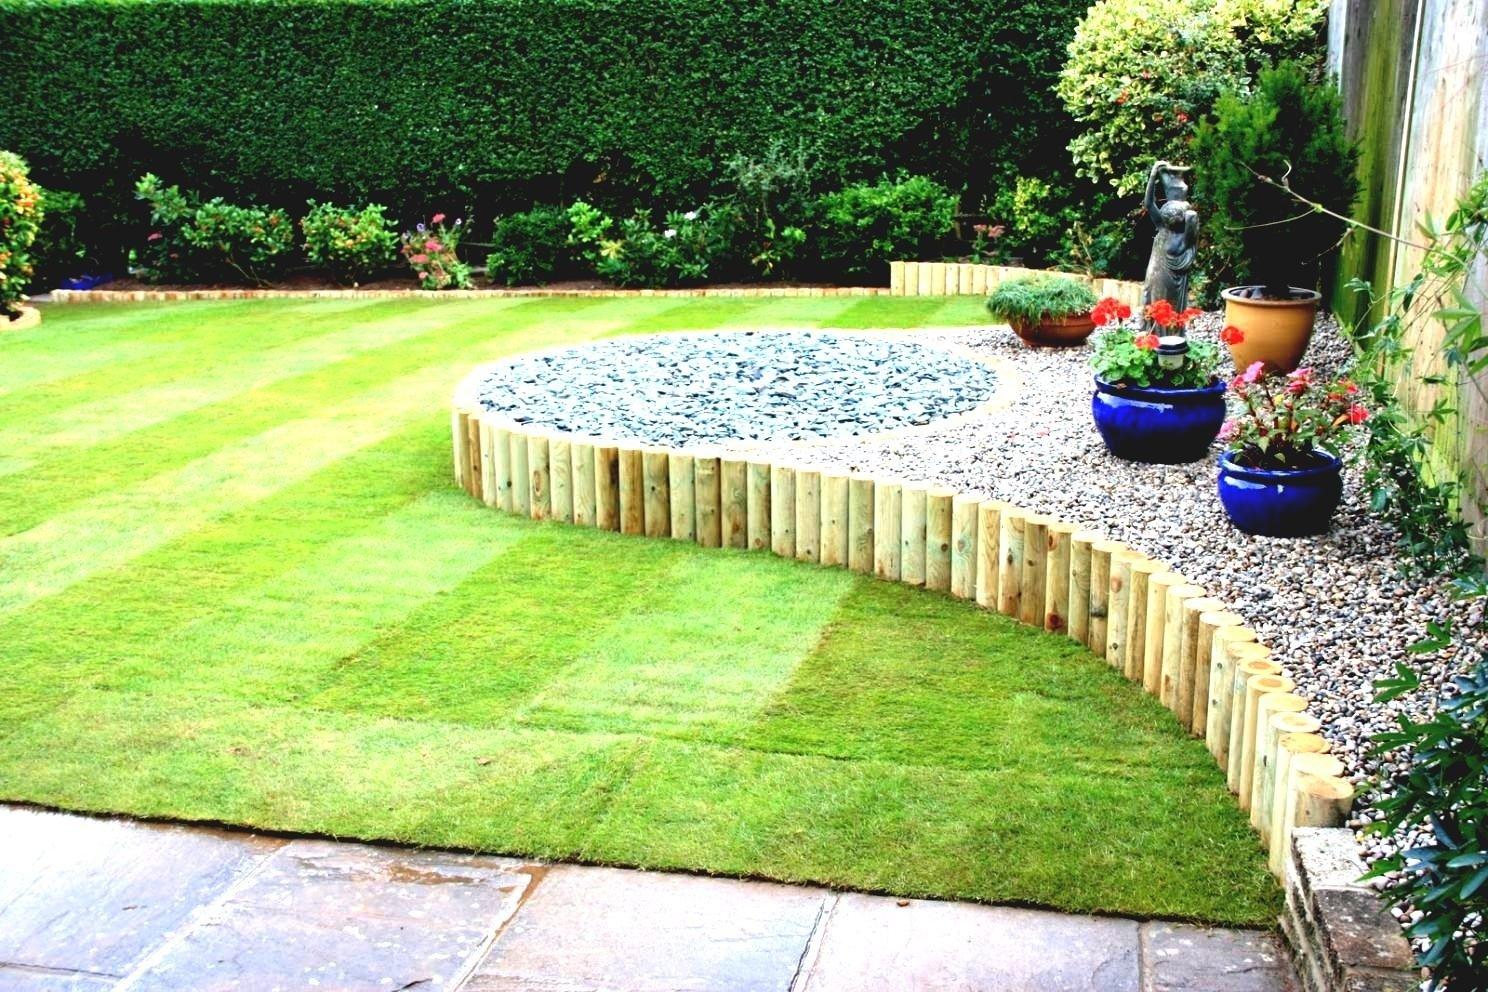 10 Stylish Simple Front Yard Landscaping Ideas On A Budget landscaping ideas pictures simple front yard design decors 1 2021